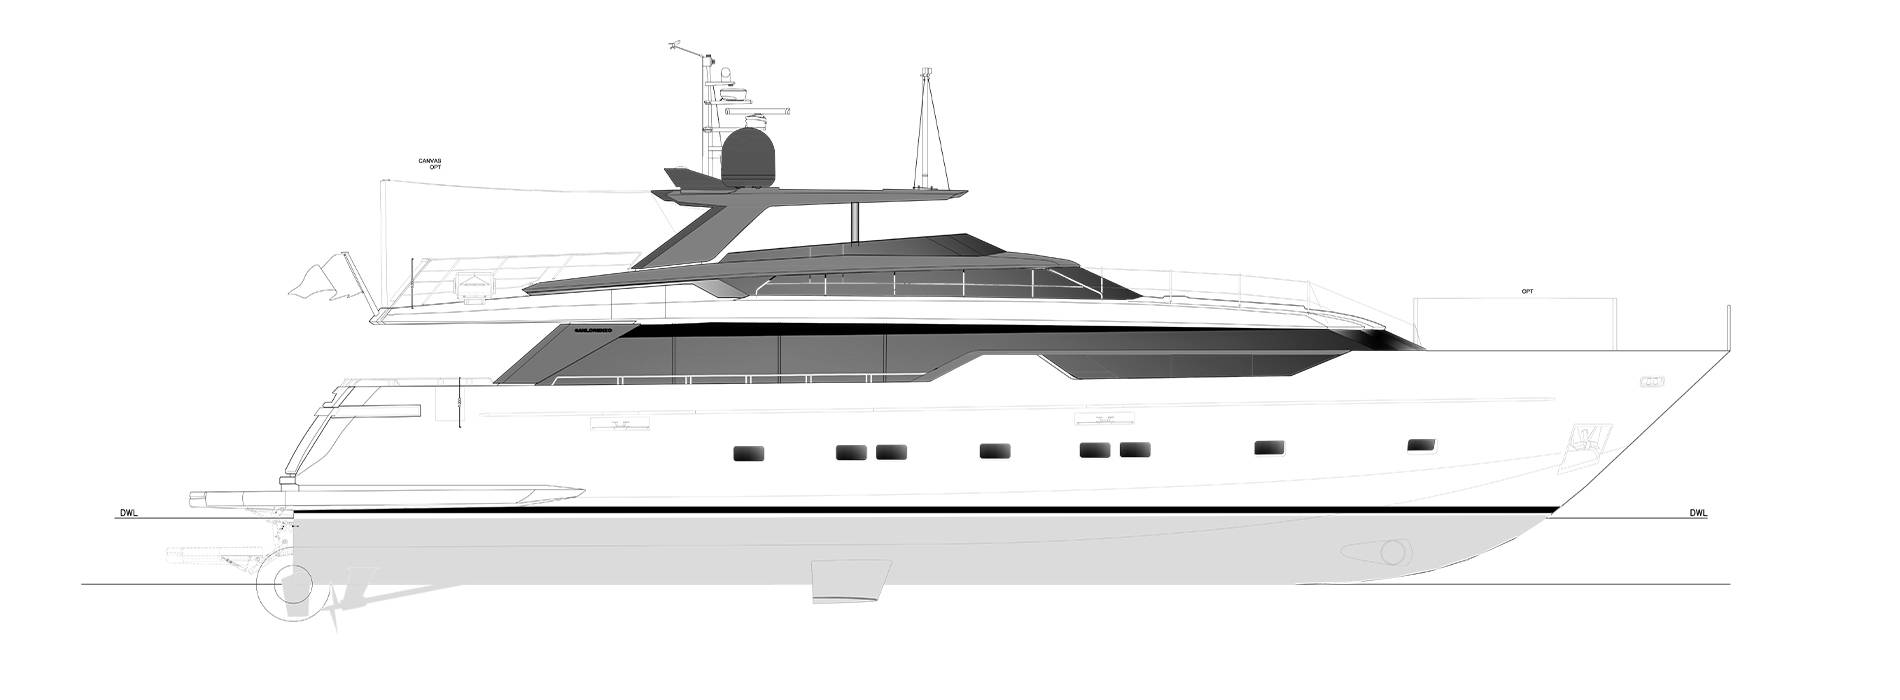 Sanlorenzo Yachts SL102A-746 Perfil